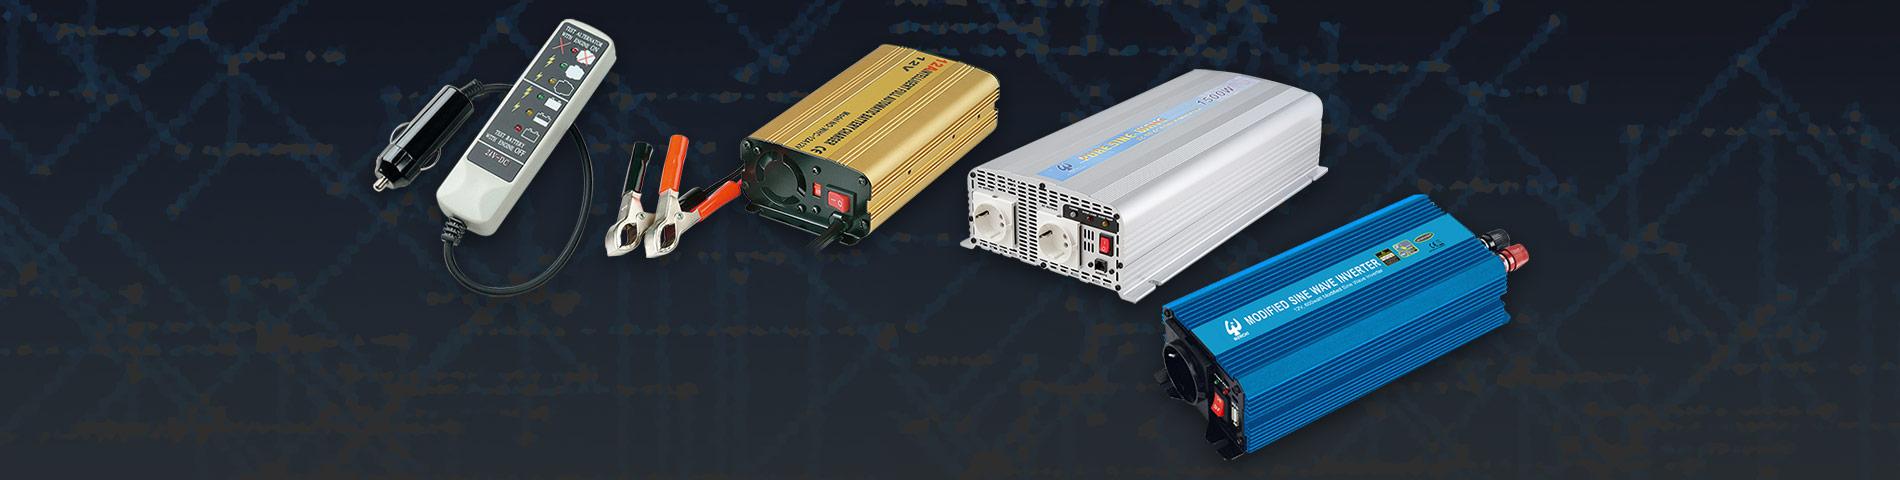 Inventive OEM Automotive Appratus Power Products Professional